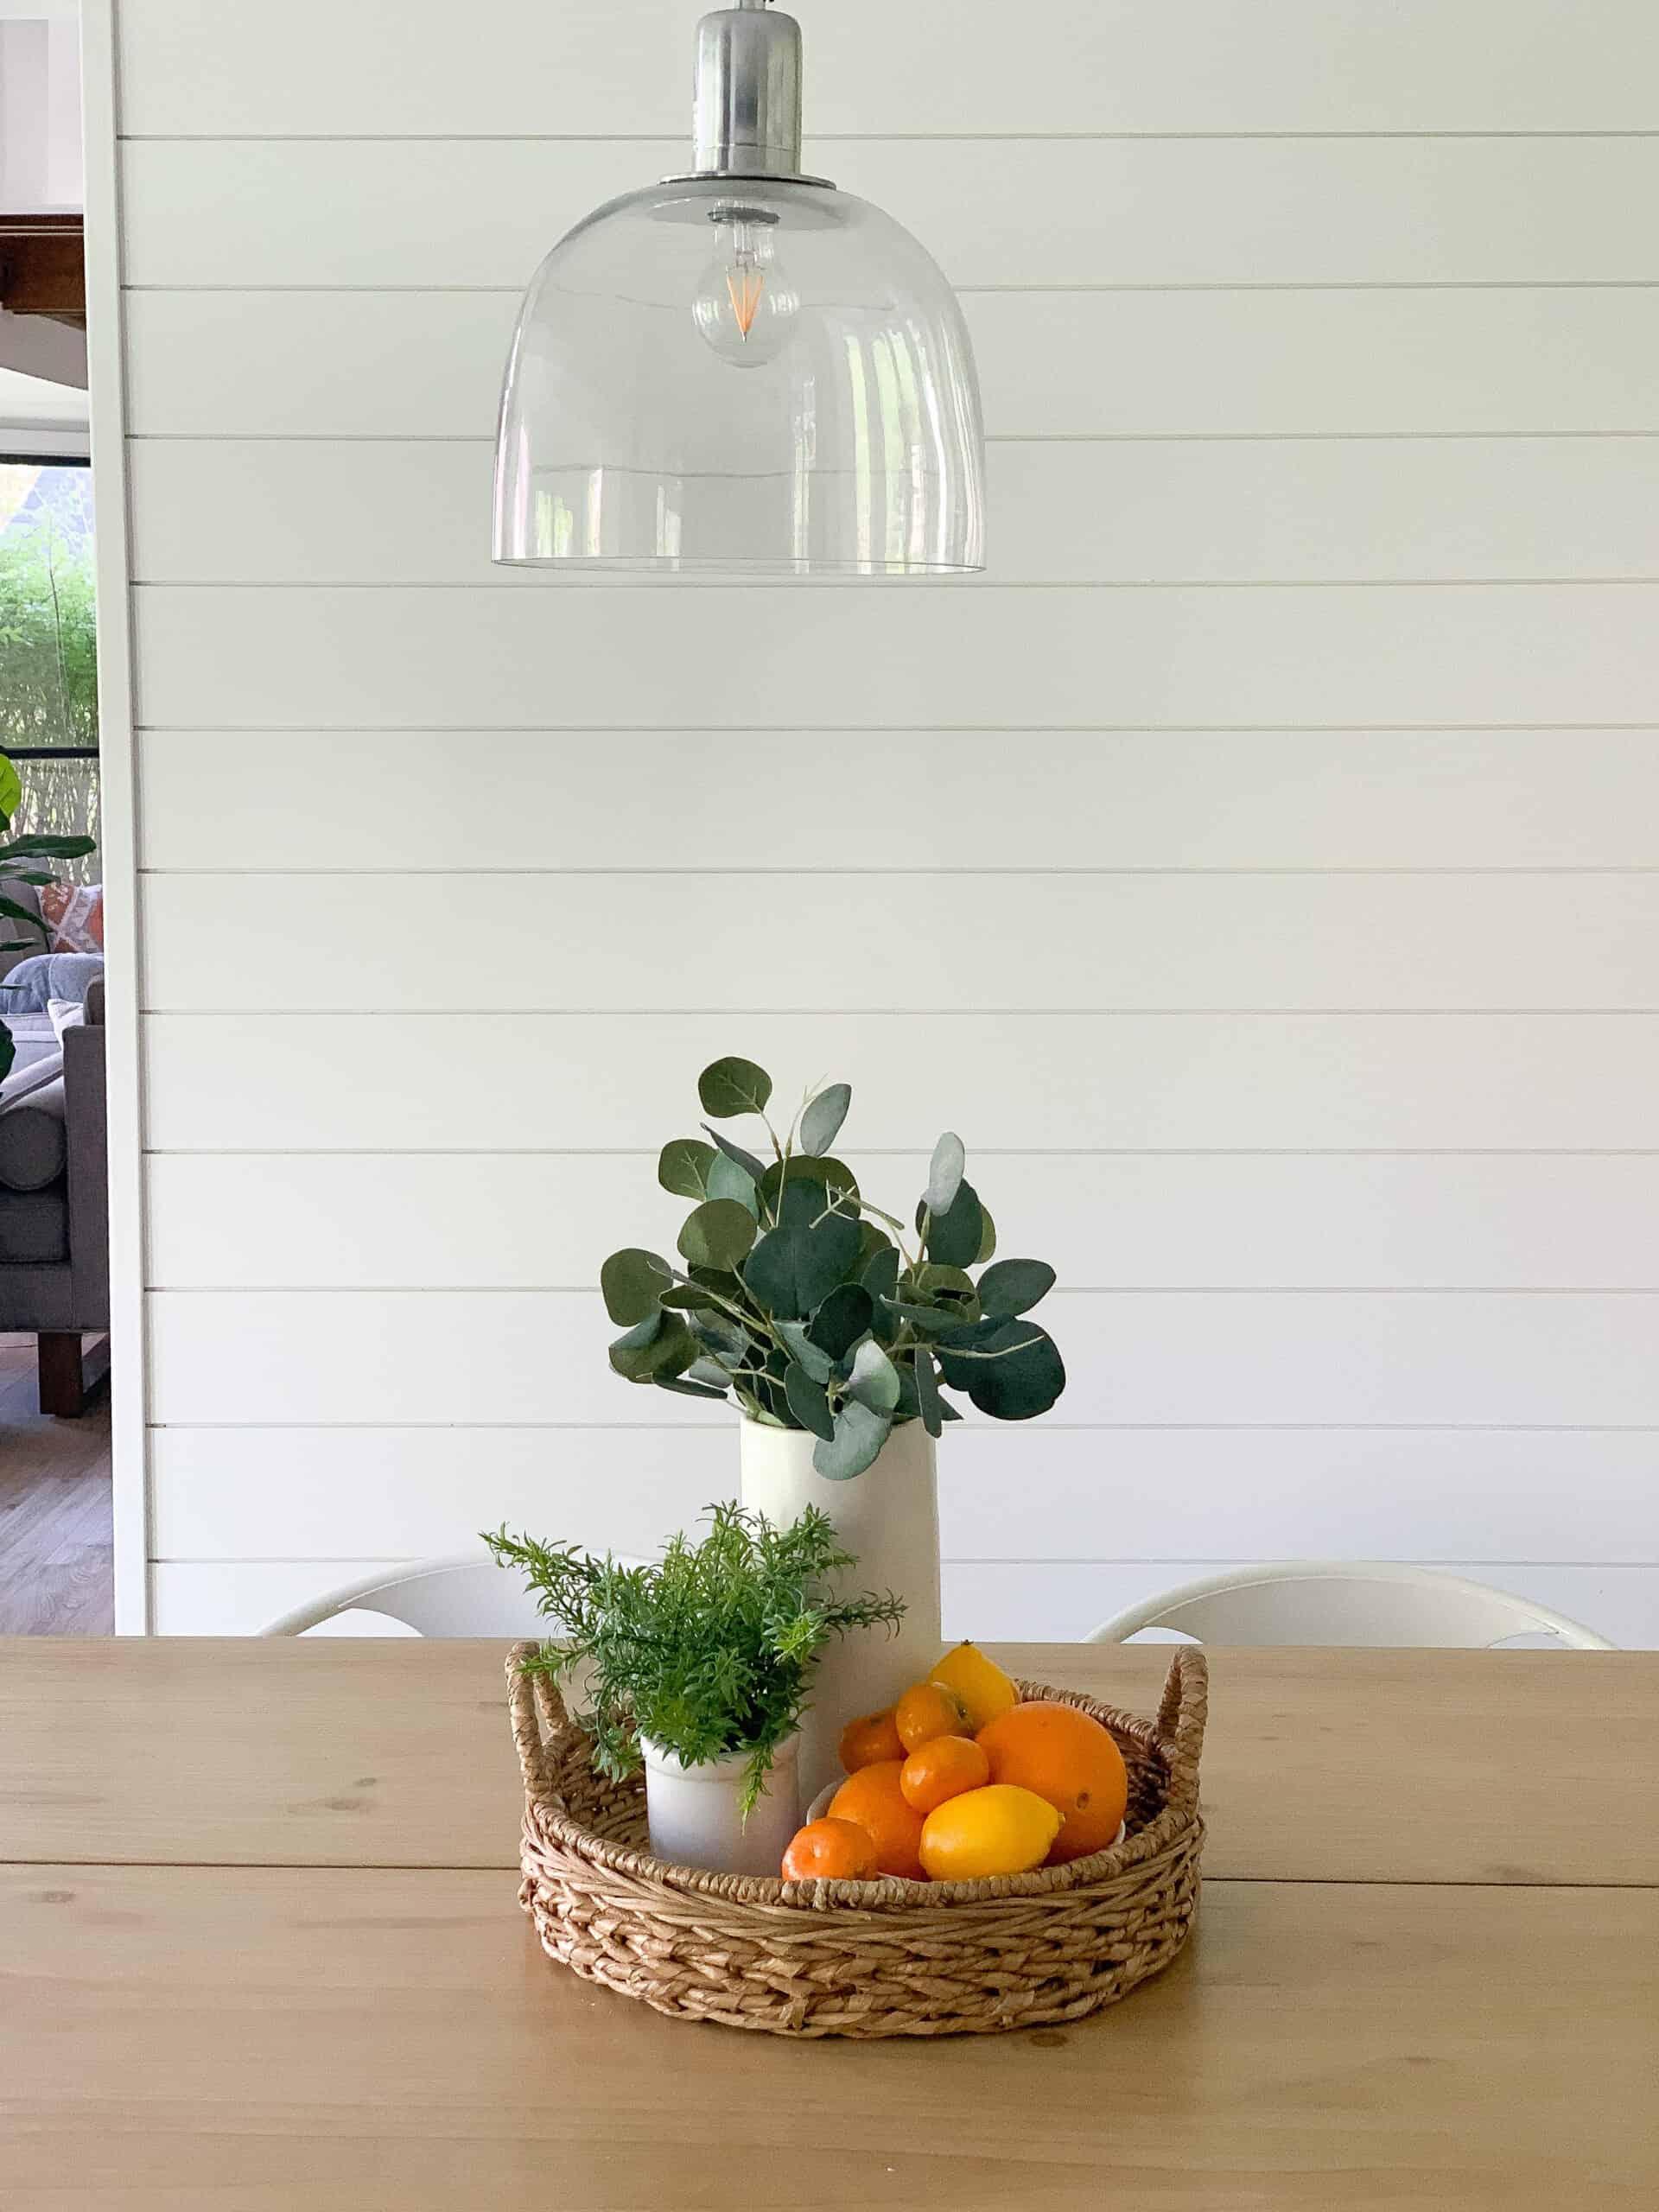 DIY shiplap wall in kitchen